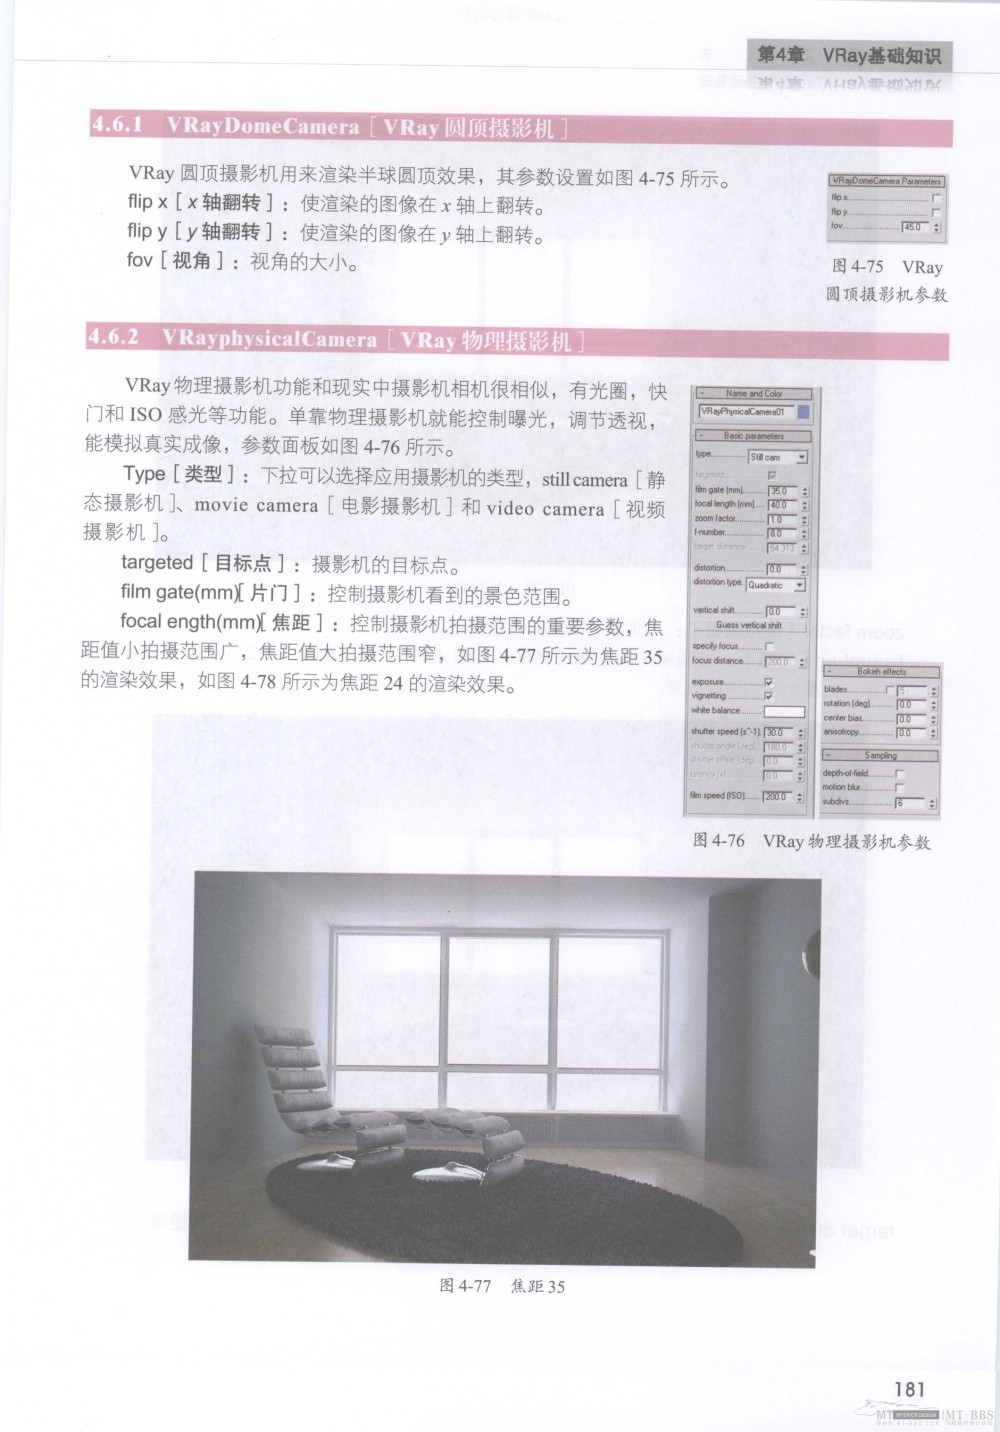 水晶石技法-3ds_Max&VRay室内空间表现_水晶石技法-3ds_Max&VRay室内空间表现_页面_187.jpg